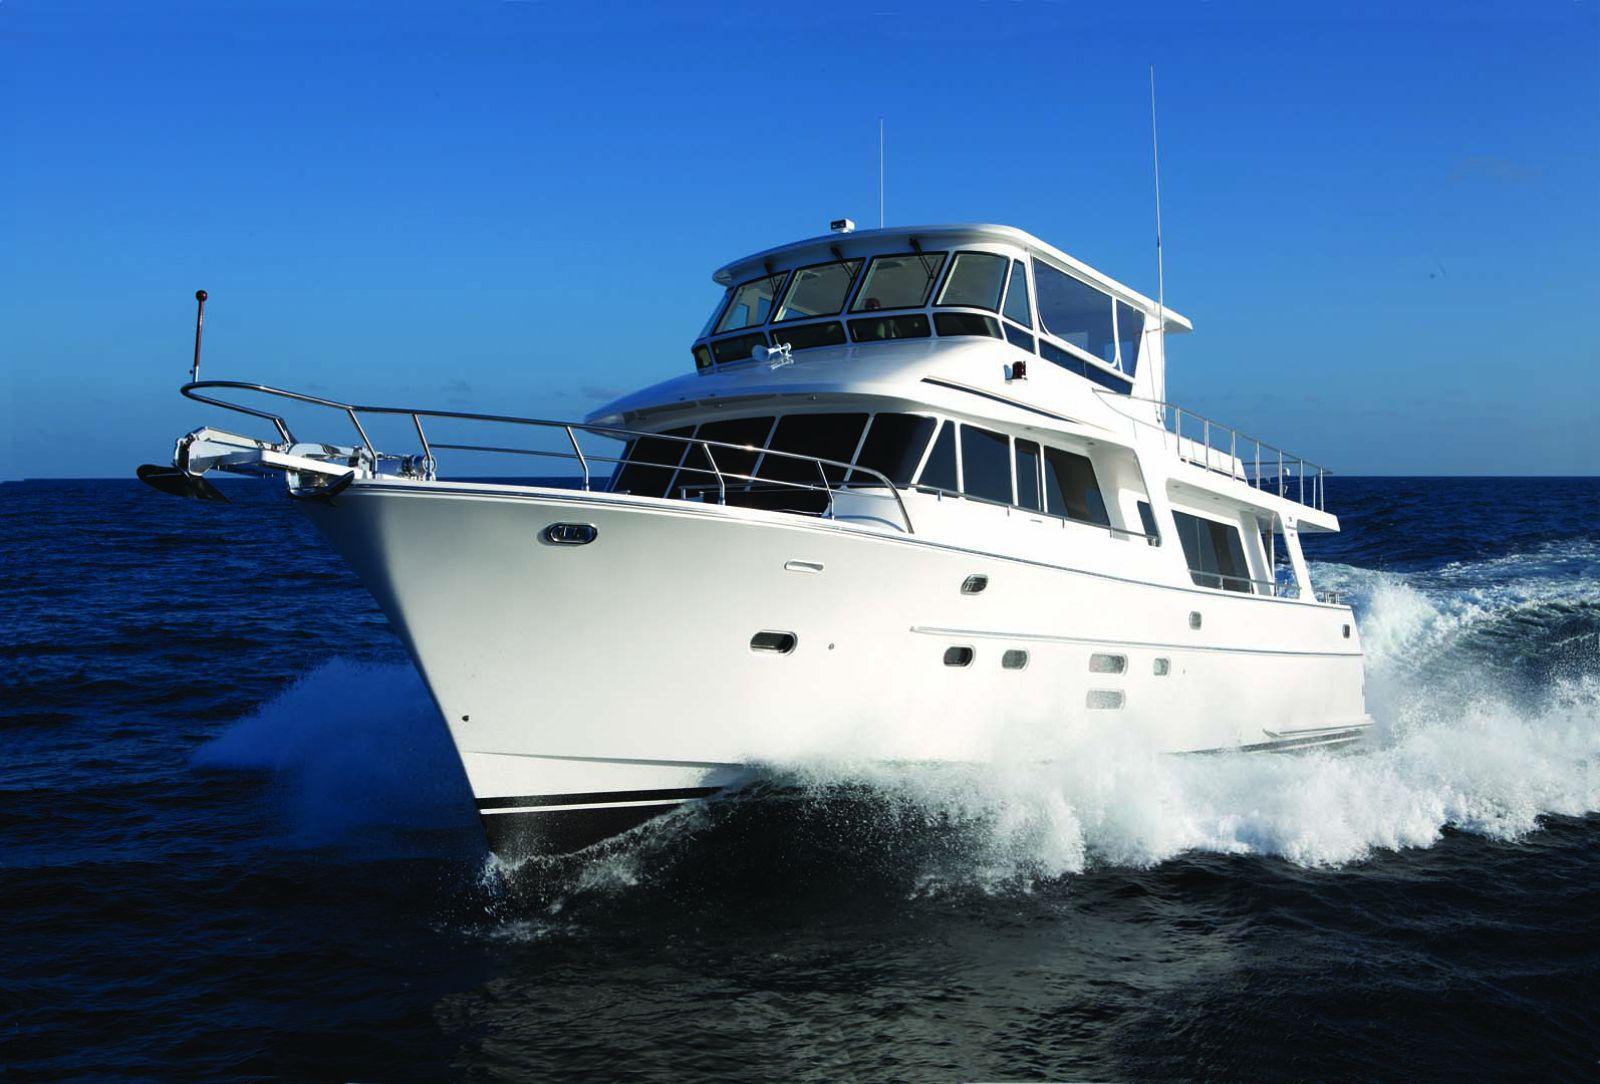 Endurance 680 yacht cruising